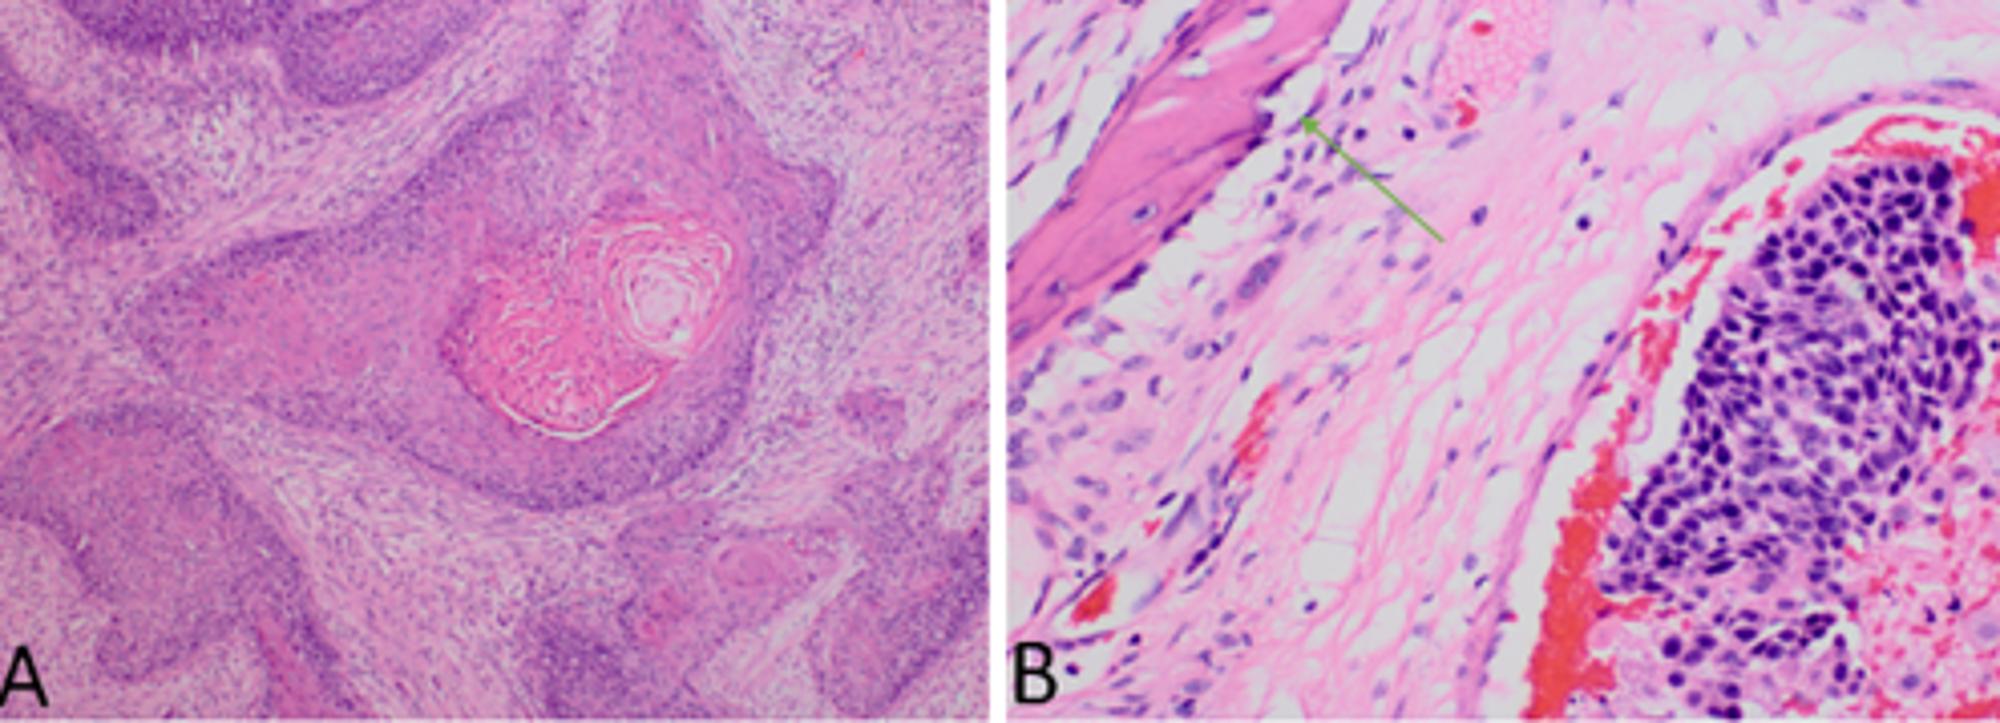 nasal inverted papilloma causes human papillomavirus in hands